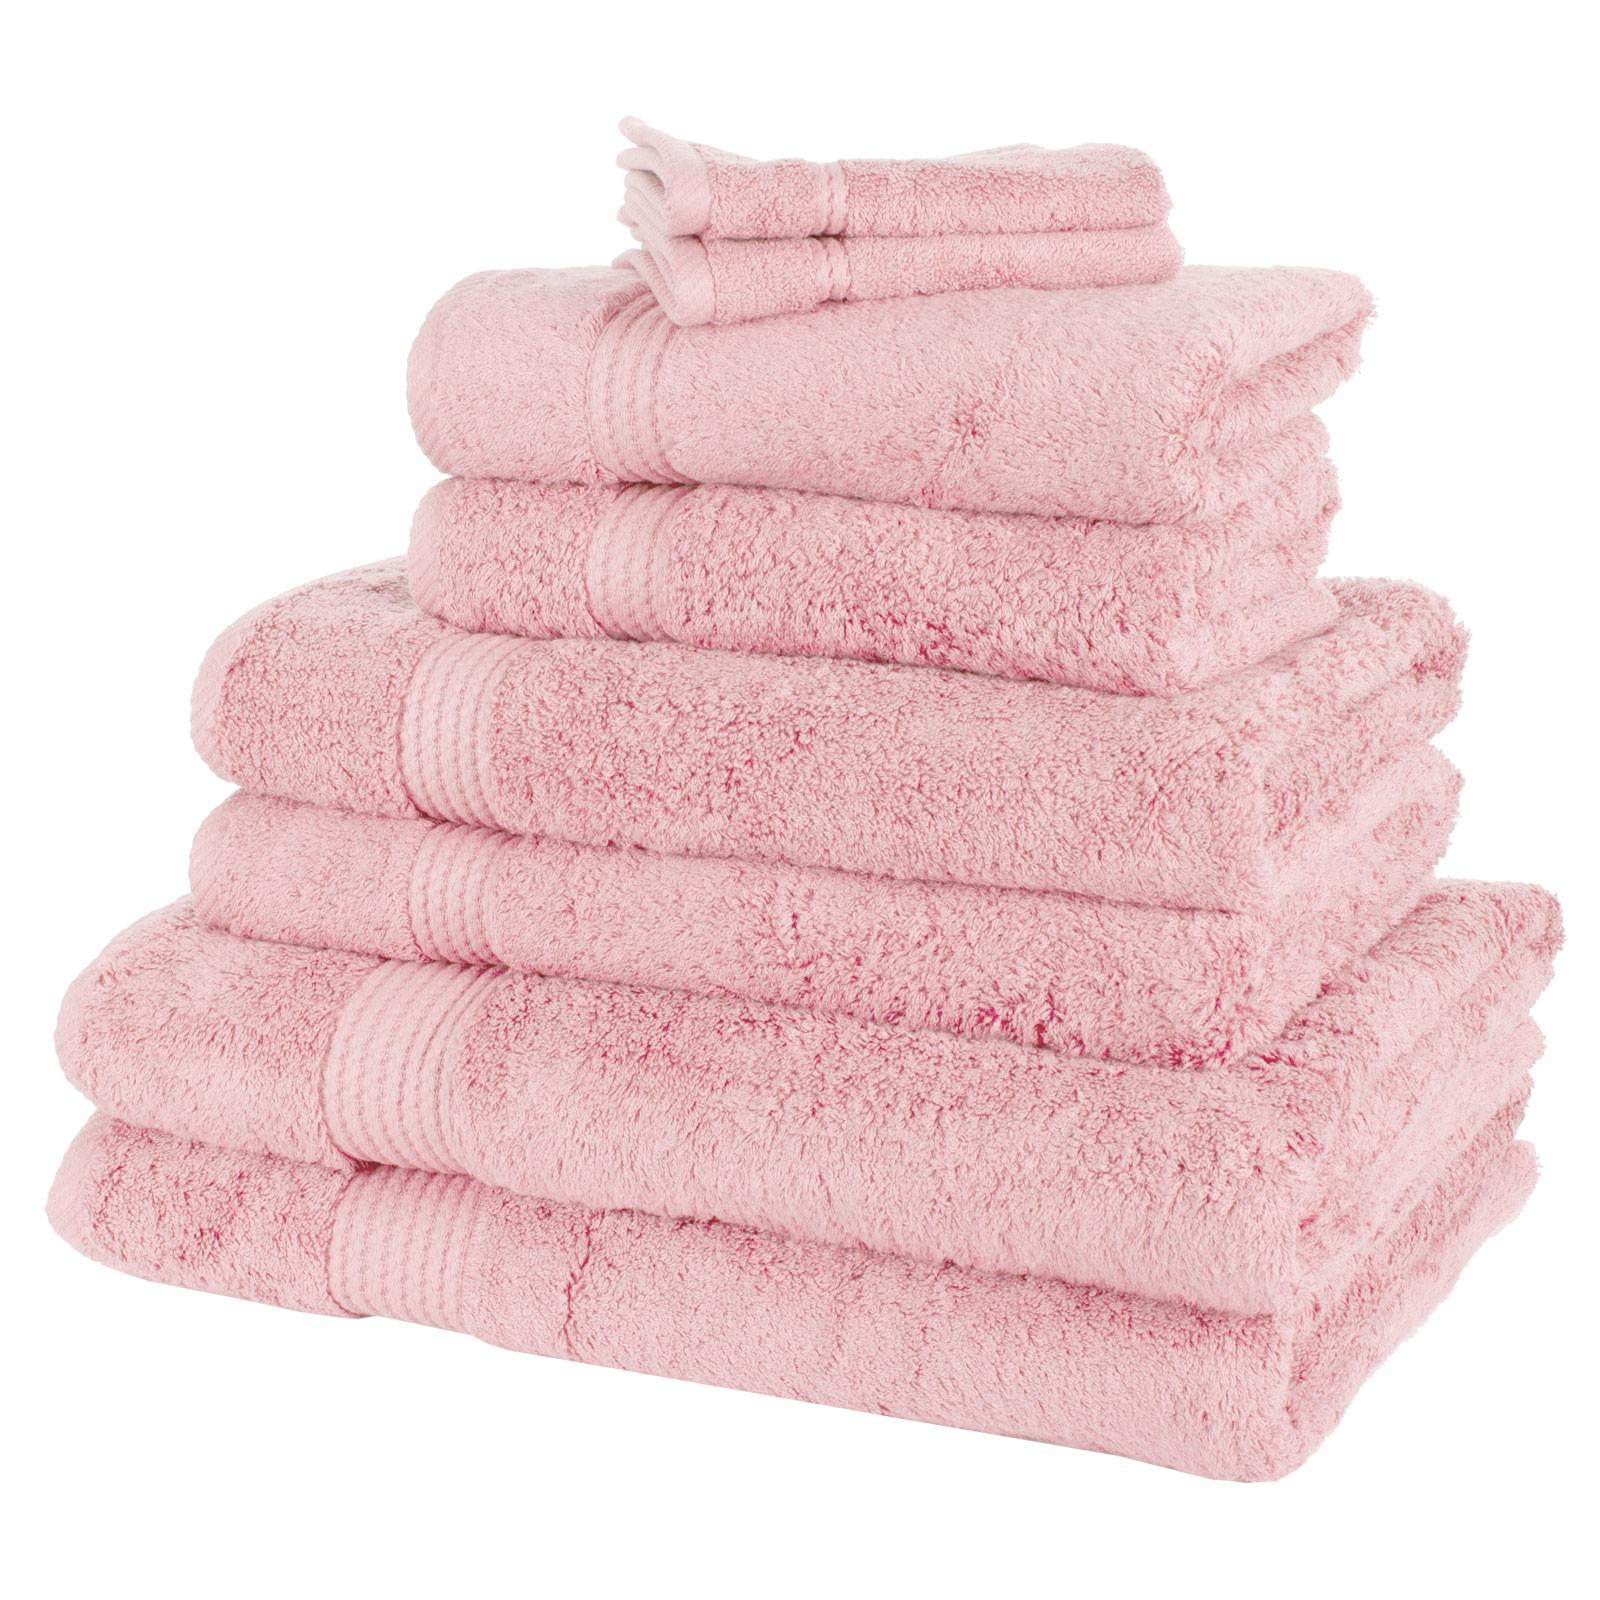 Luxury Soft Bamboo Bathroom Bath Linen Face Cloth Flannel